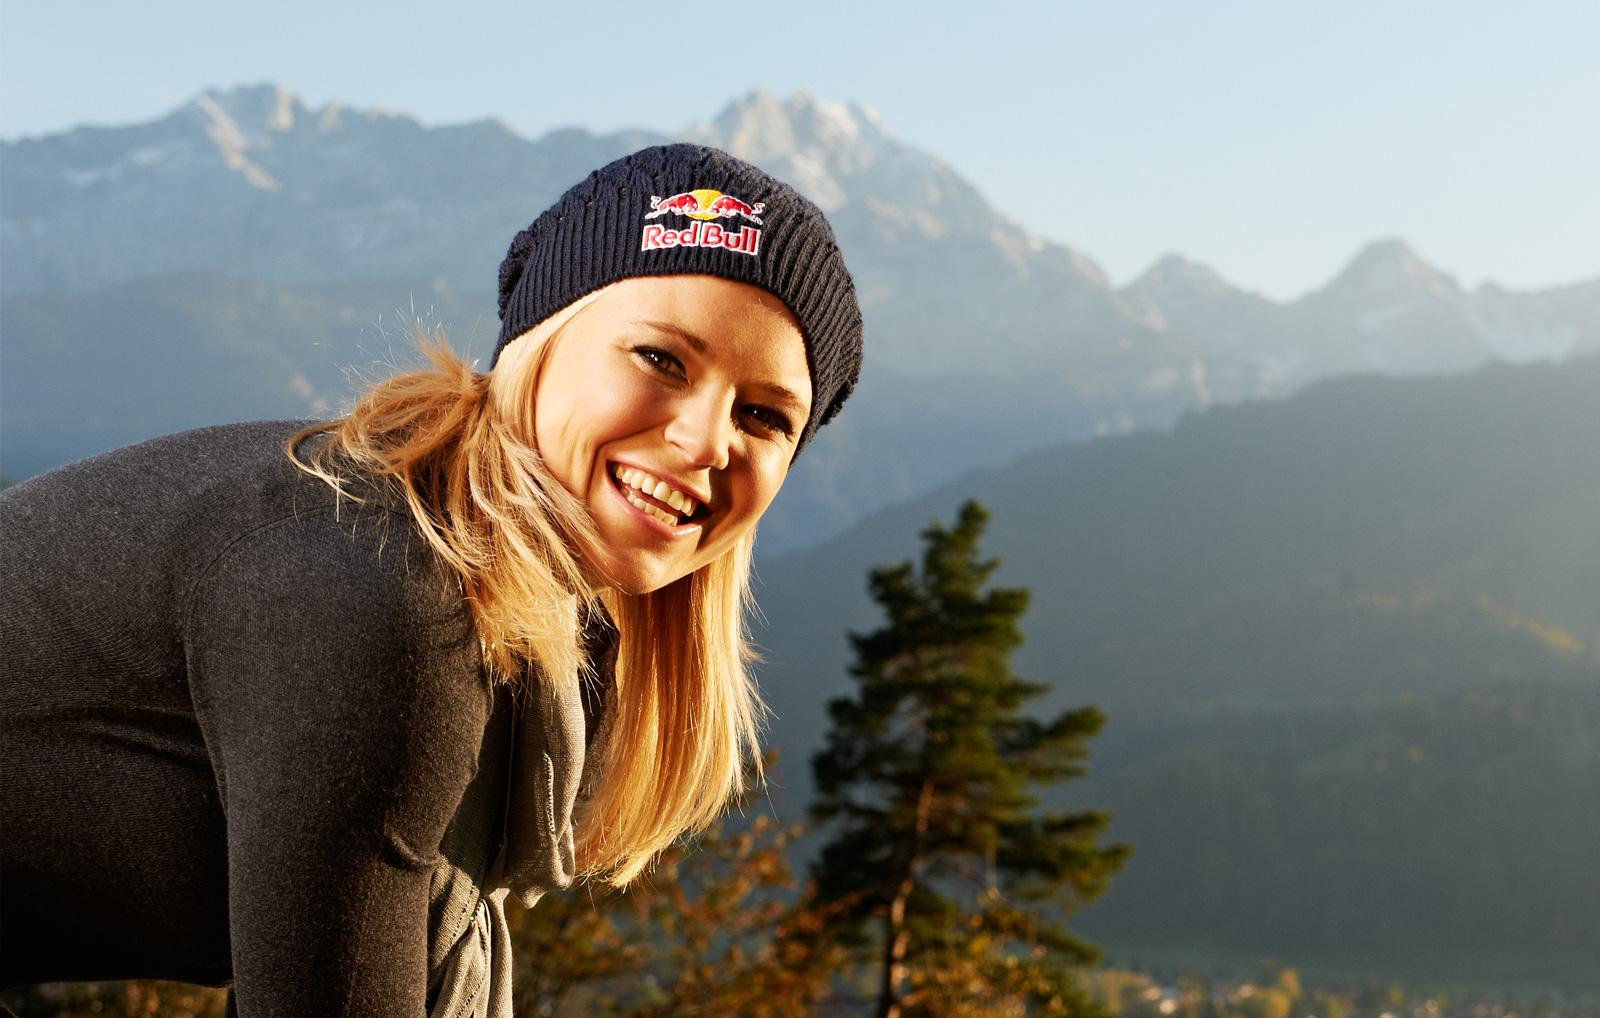 Gössner miriam | Gössner Scores Women's Sprint Win in Ruhpolding